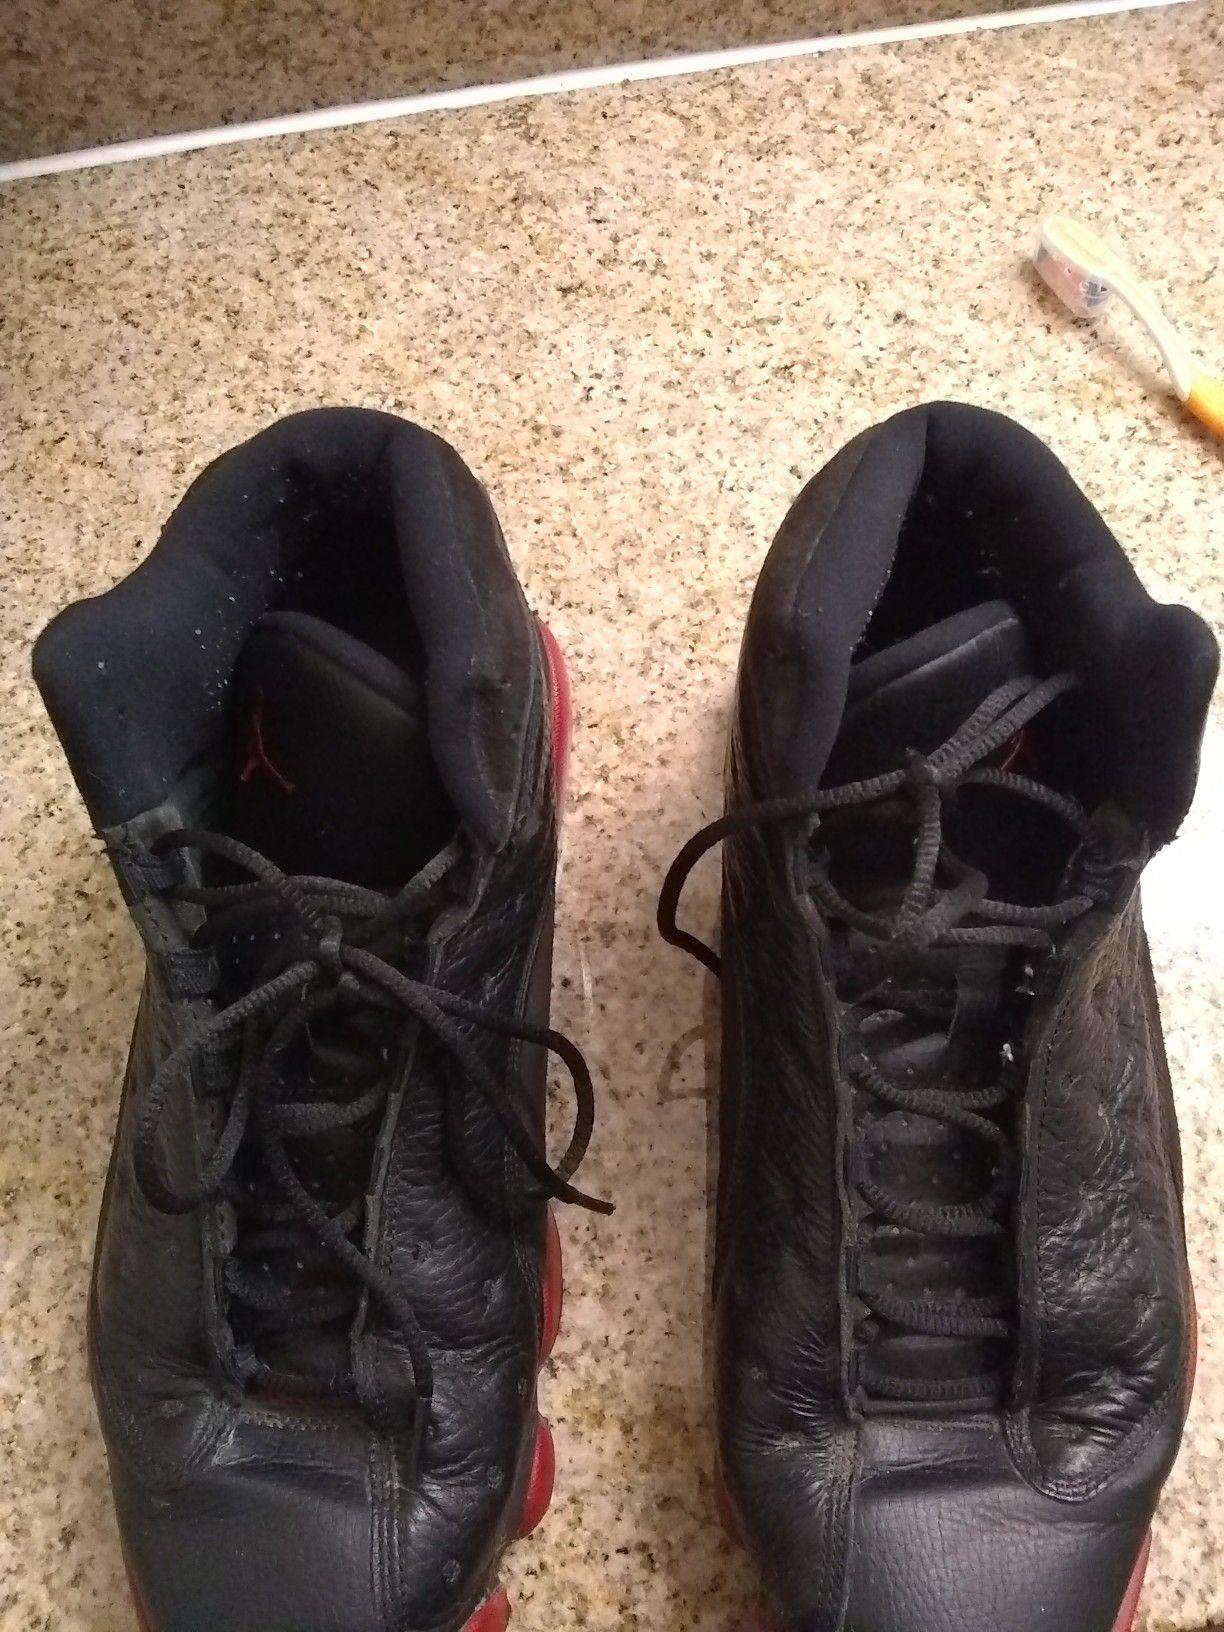 Jordans size 11.5